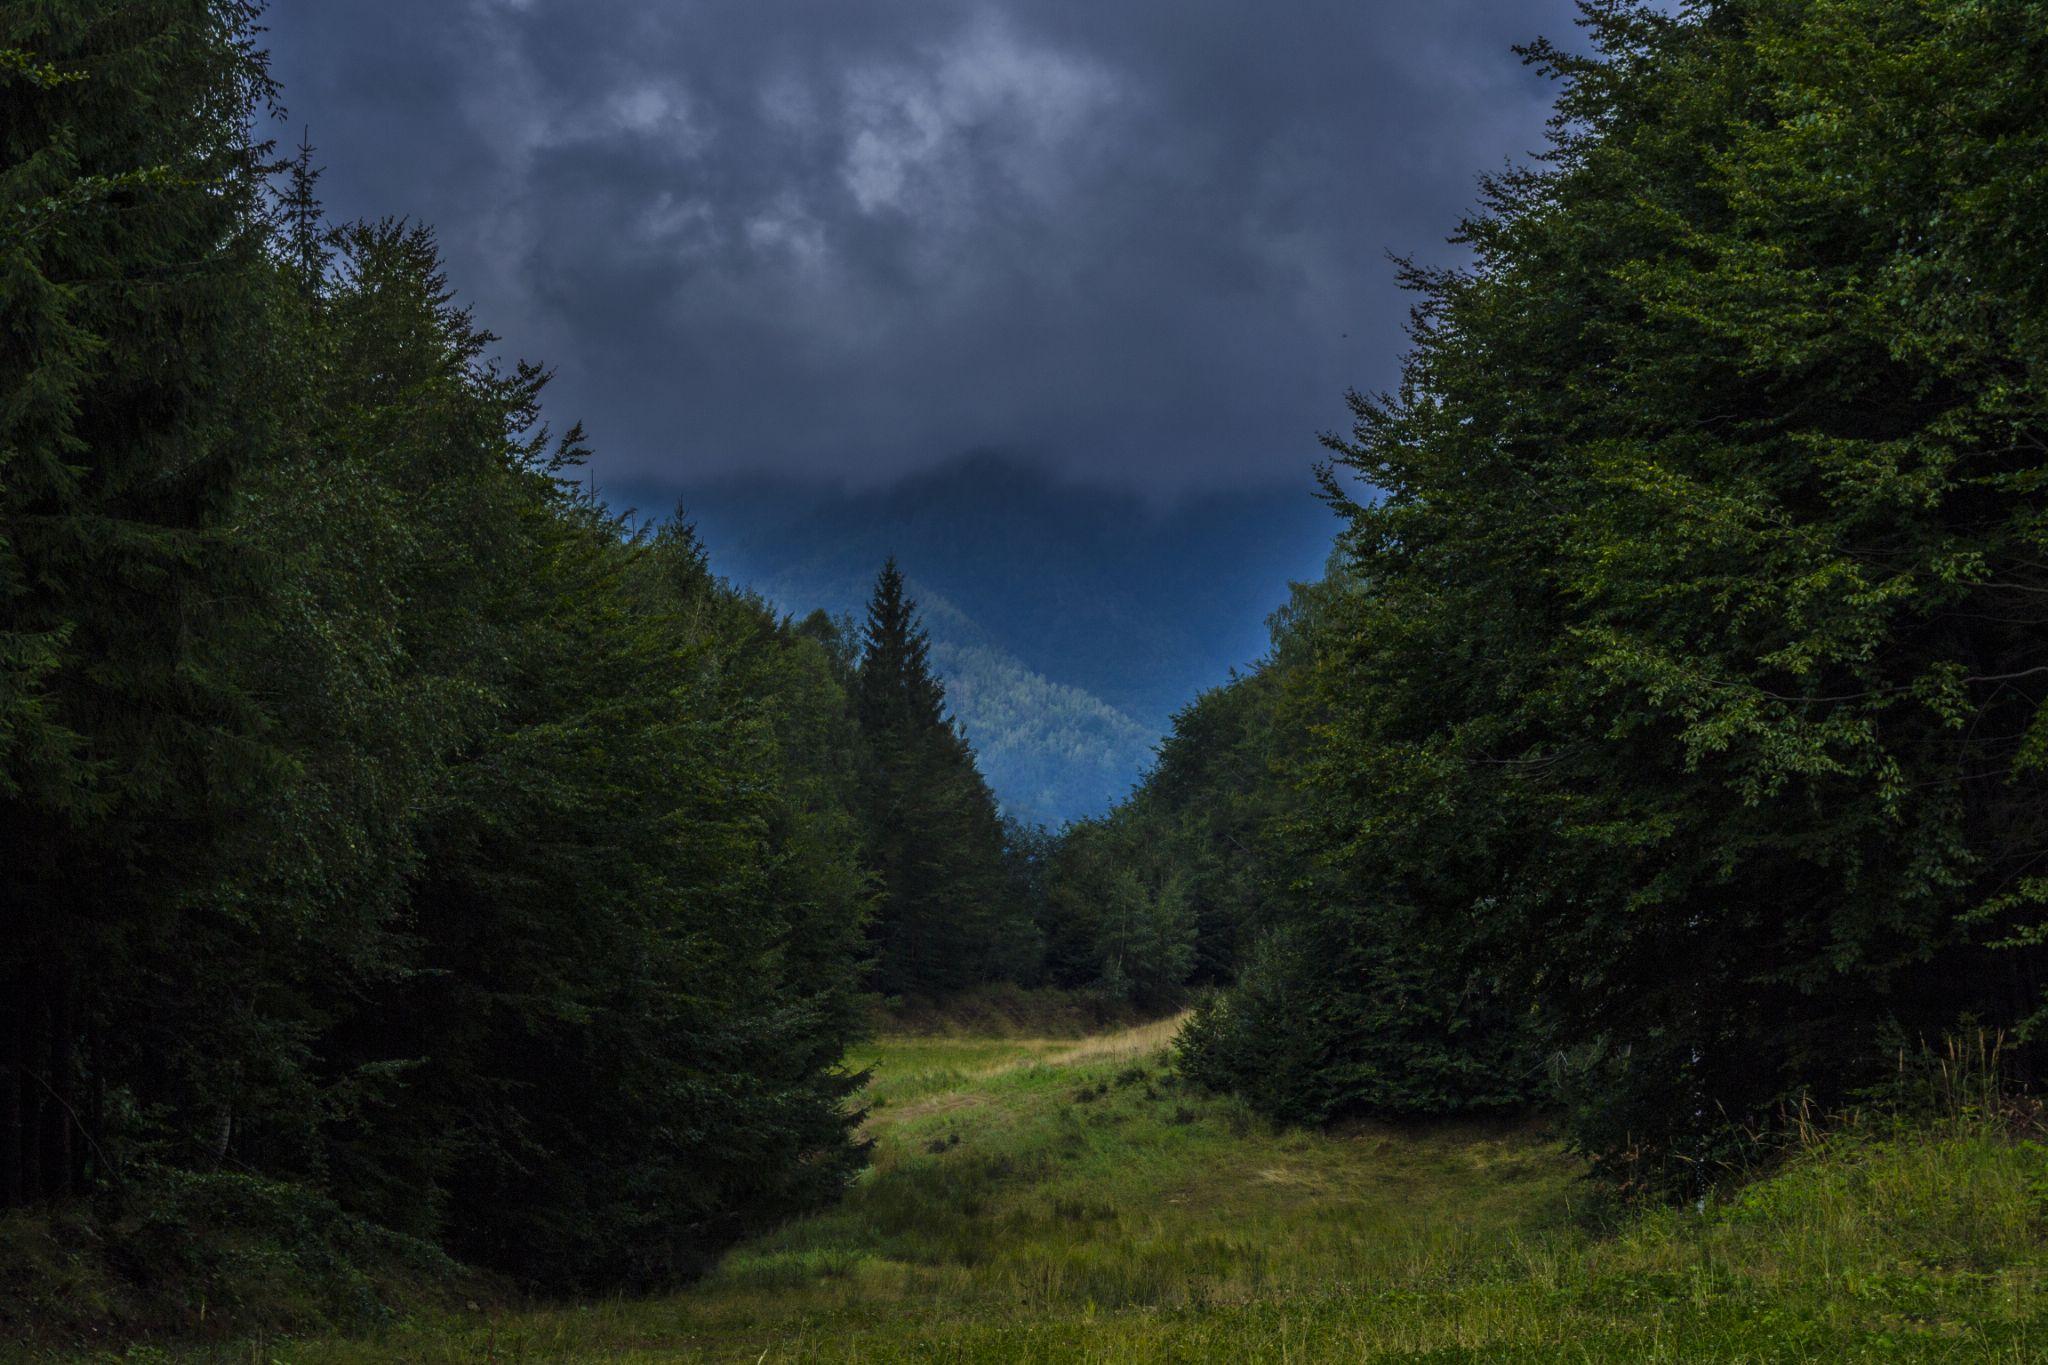 Among trees by Răzvan Bîrle